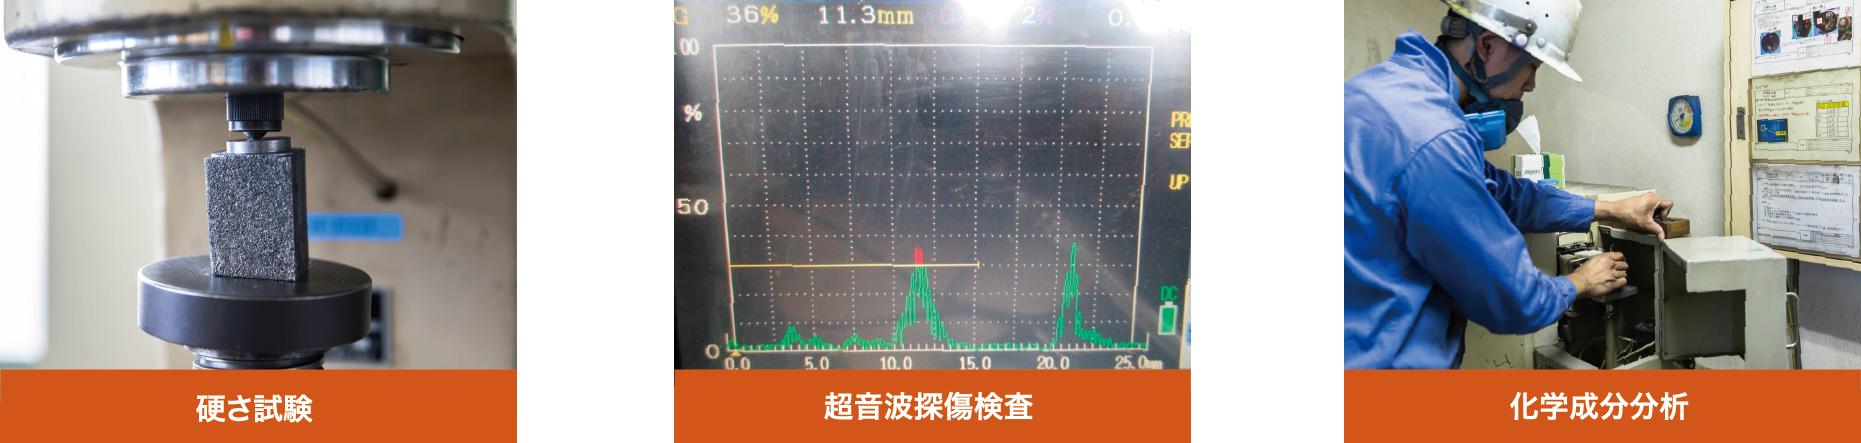 硬さ試験 超音波深傷検査写真